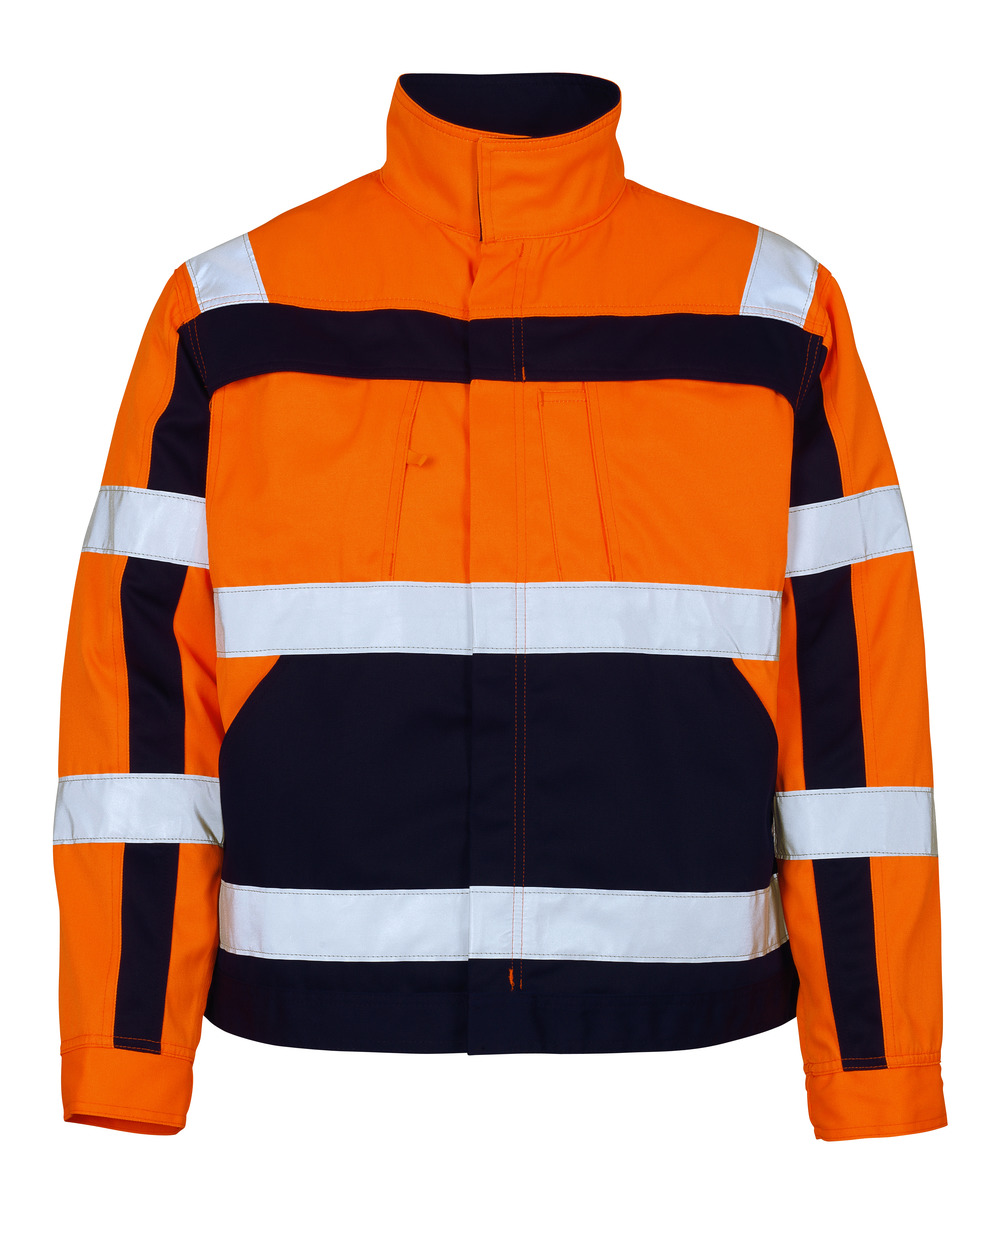 07109-860-141 Jakke - hi-vis oransje/marine